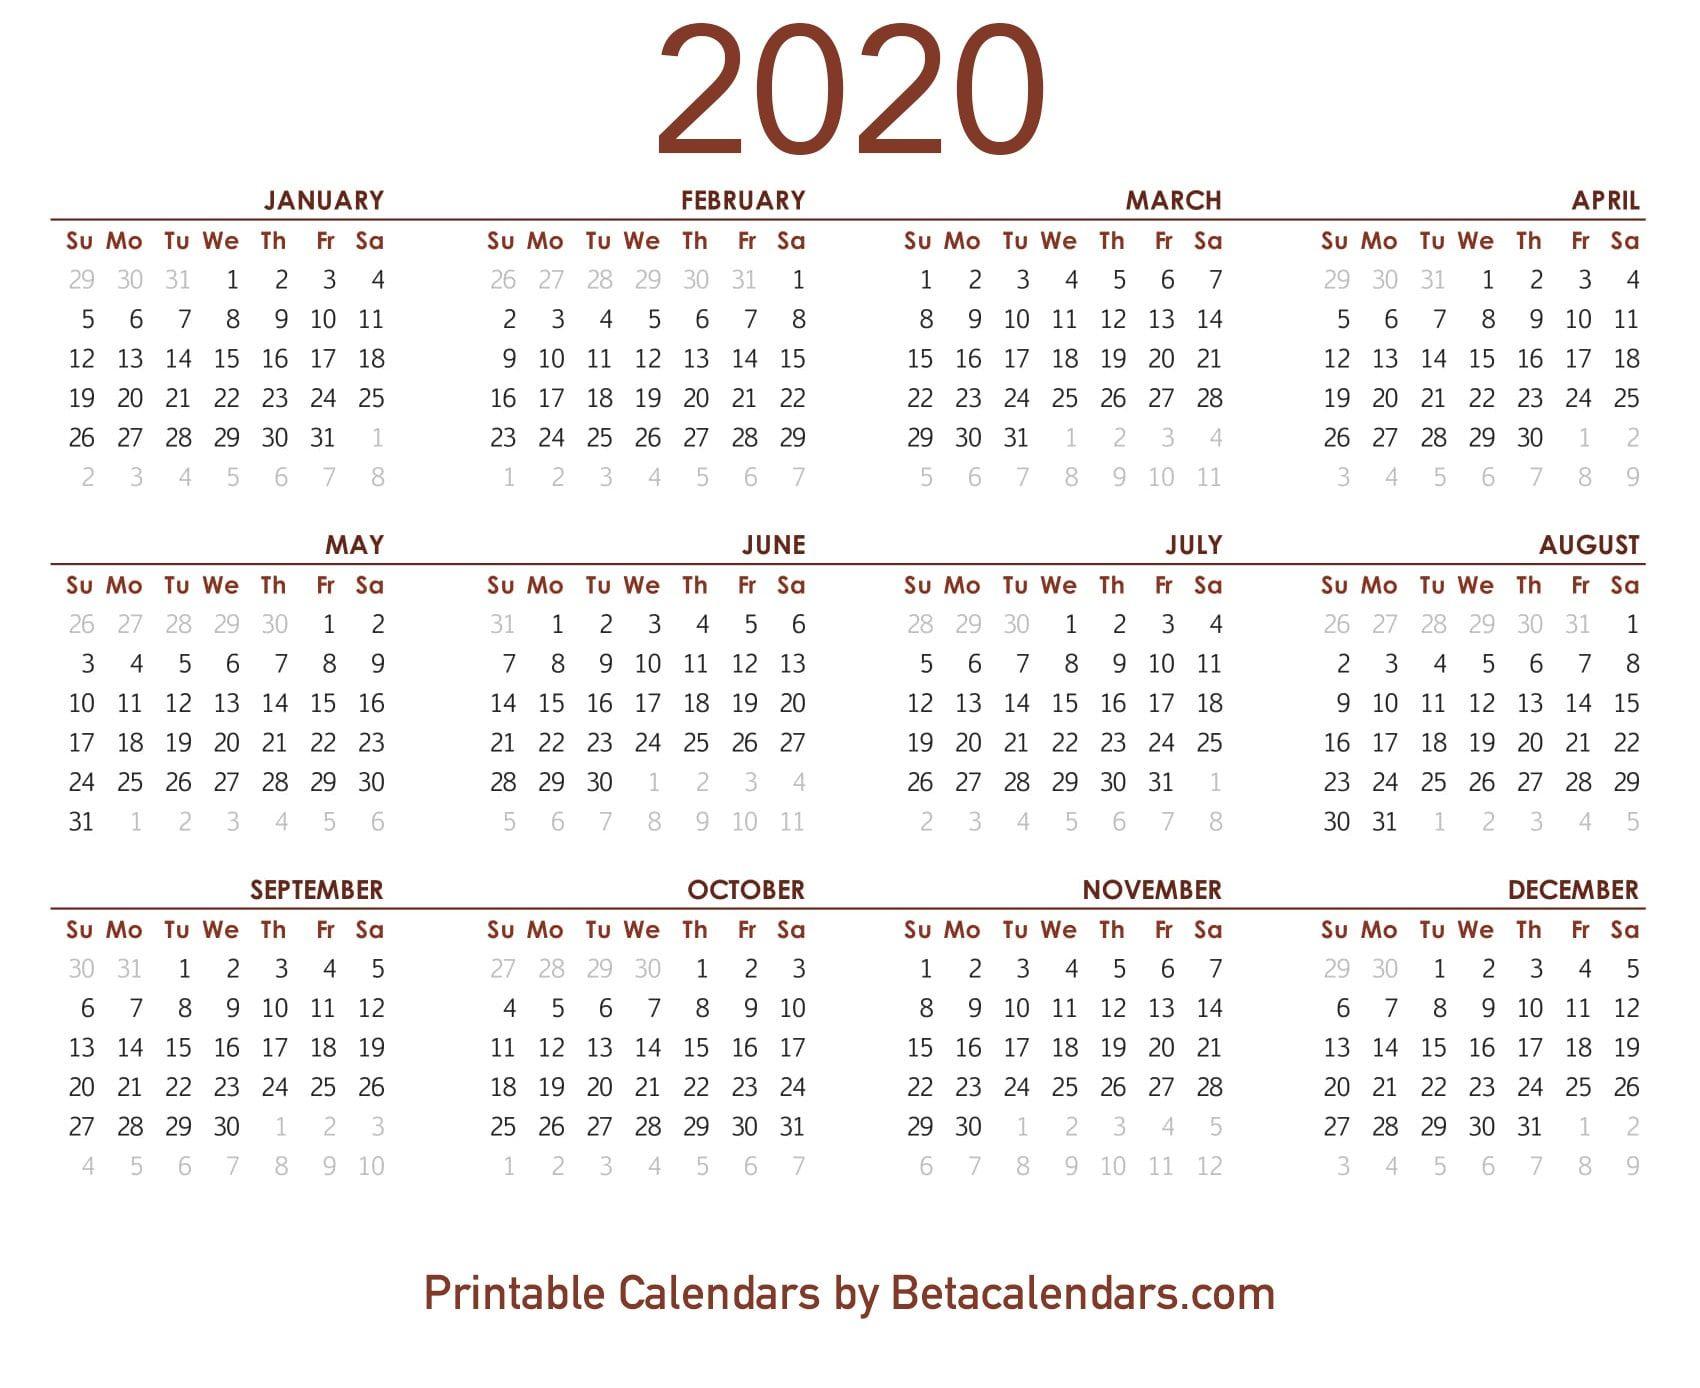 2020 Calendar 8 12 X 11 | Free Printable Calendar pertaining to 8X11 Calendar Printable